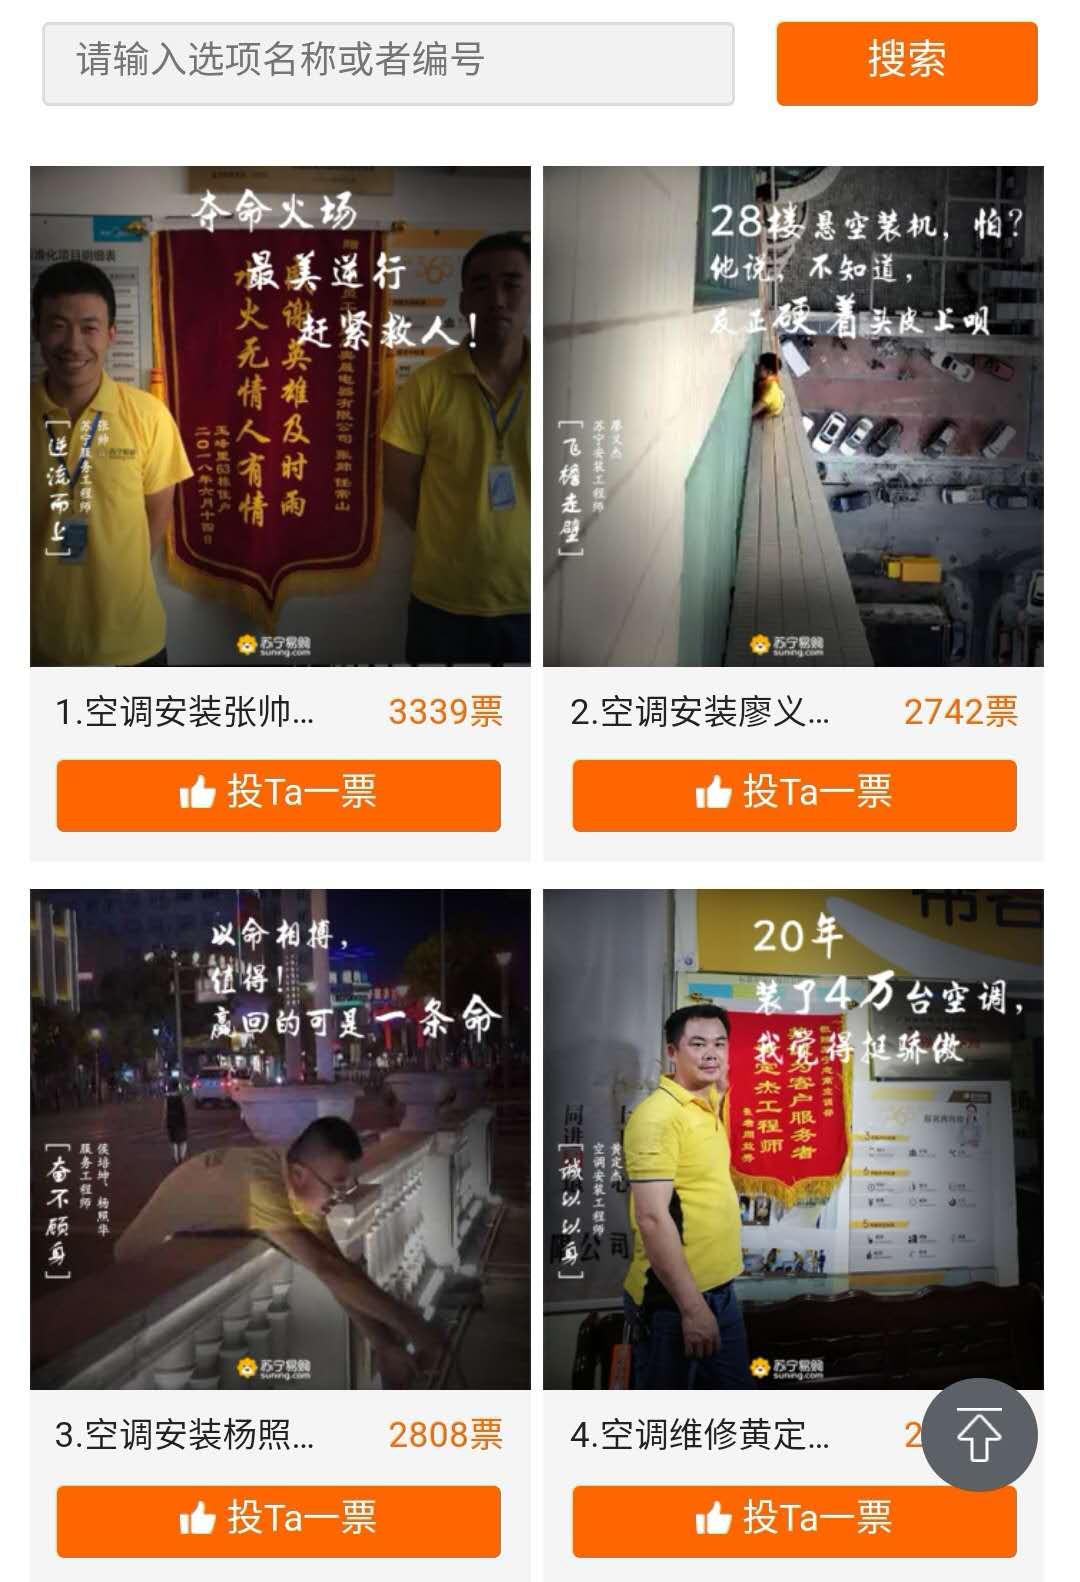 C:\Users\14051171\AppData\Local\Temp\WeChat Files\381606753144451178.jpg